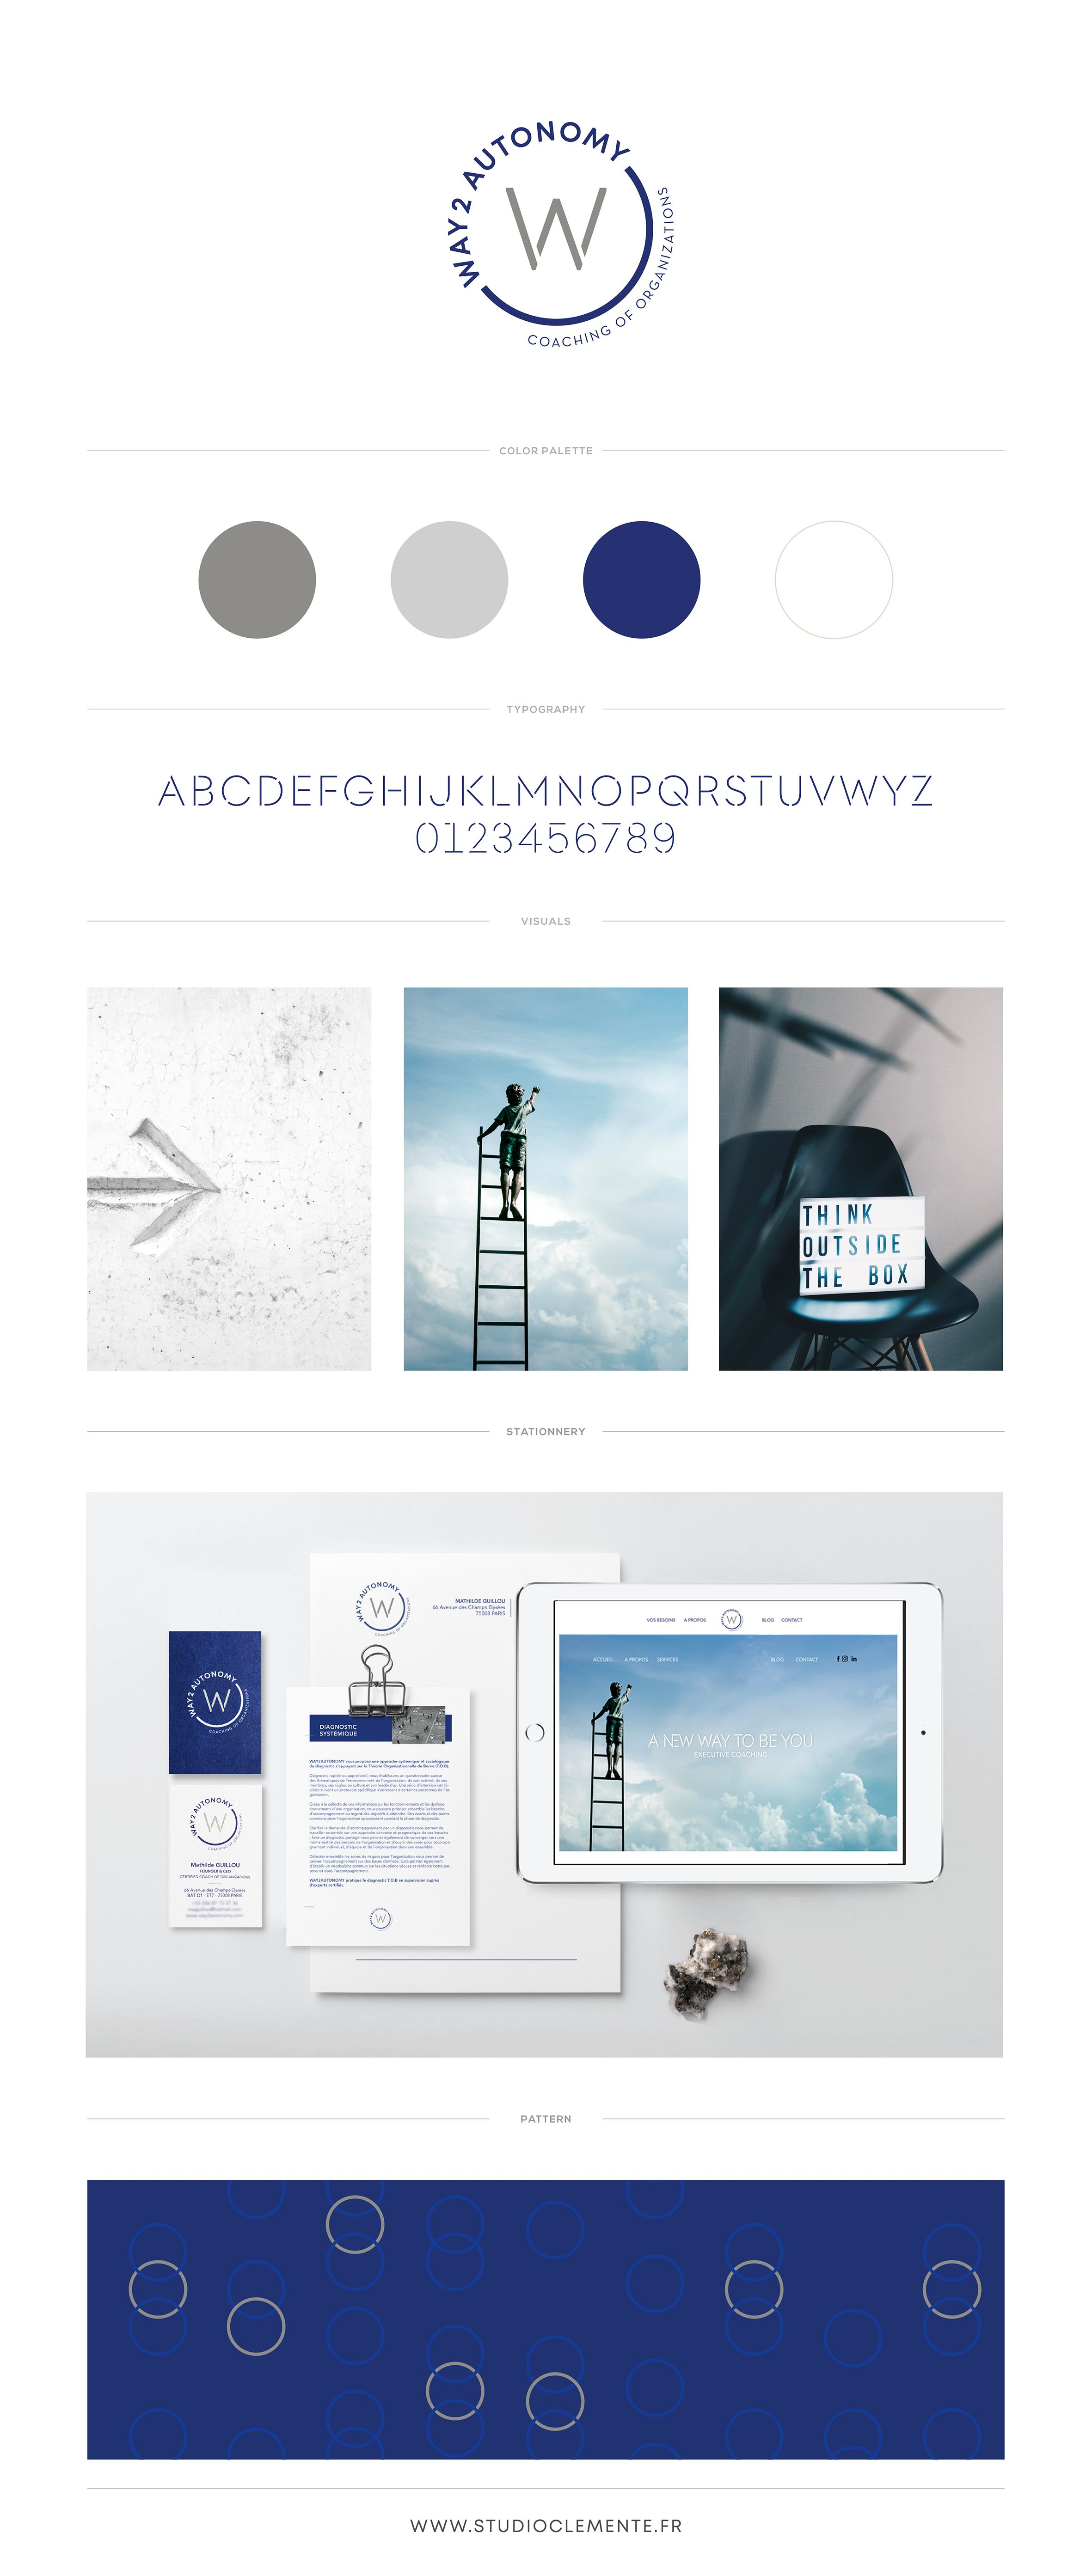 Way 2 Autonomy Studio Clemente Identite Visuelle Branding Web Design